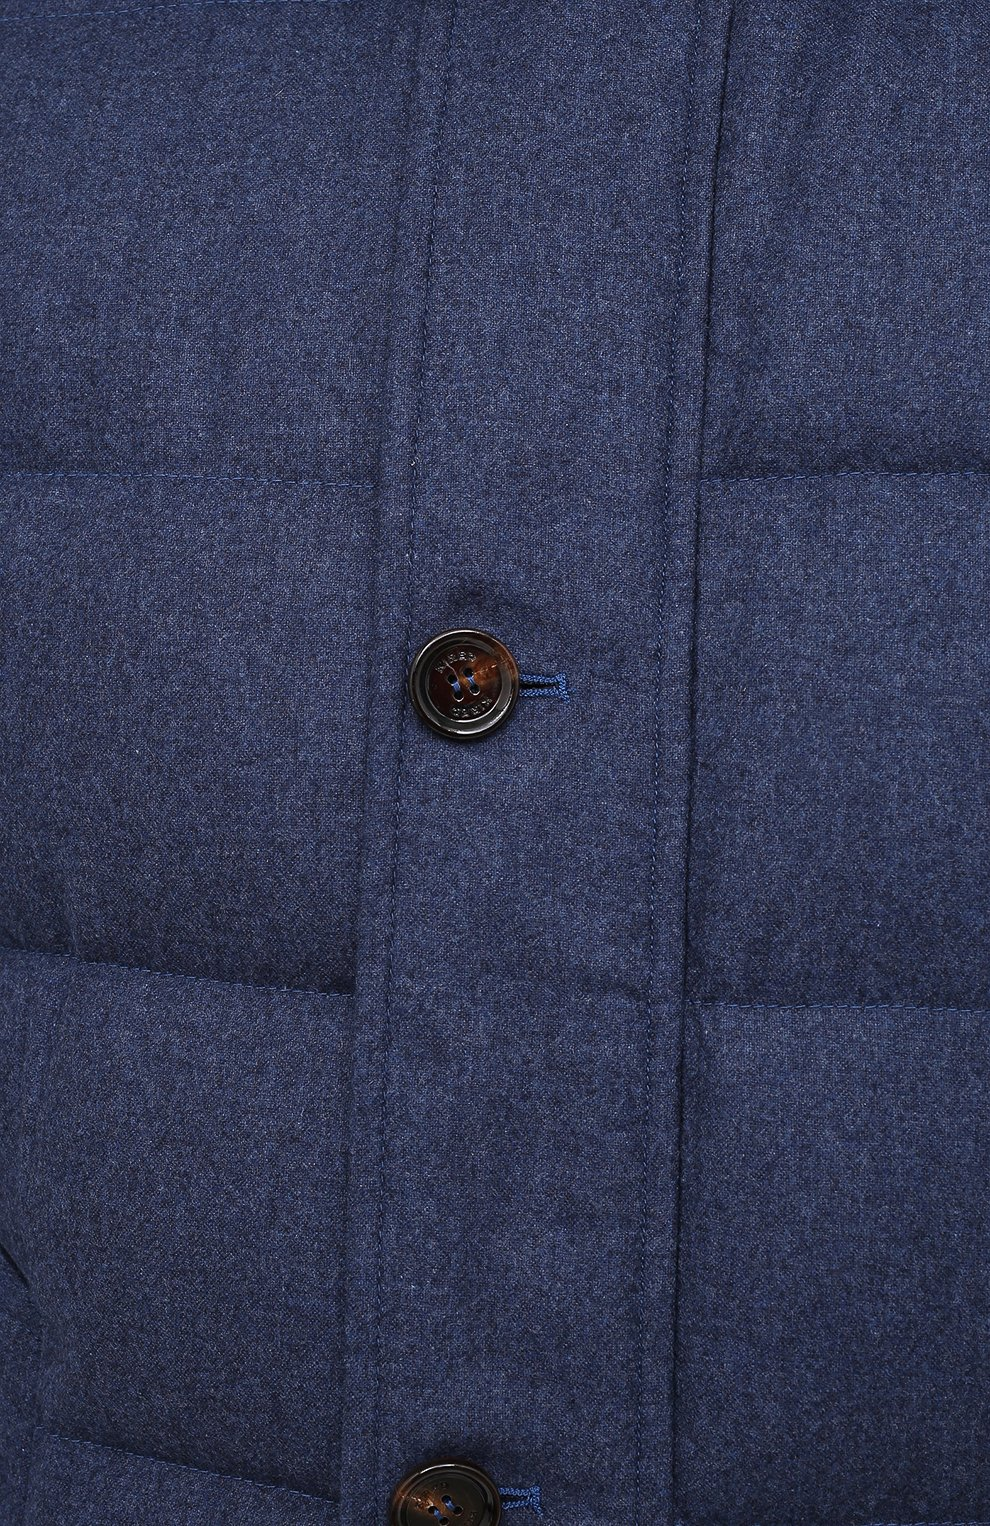 Мужская пуховик KIRED синего цвета, арт. WFAYAL2W7203004000 | Фото 6